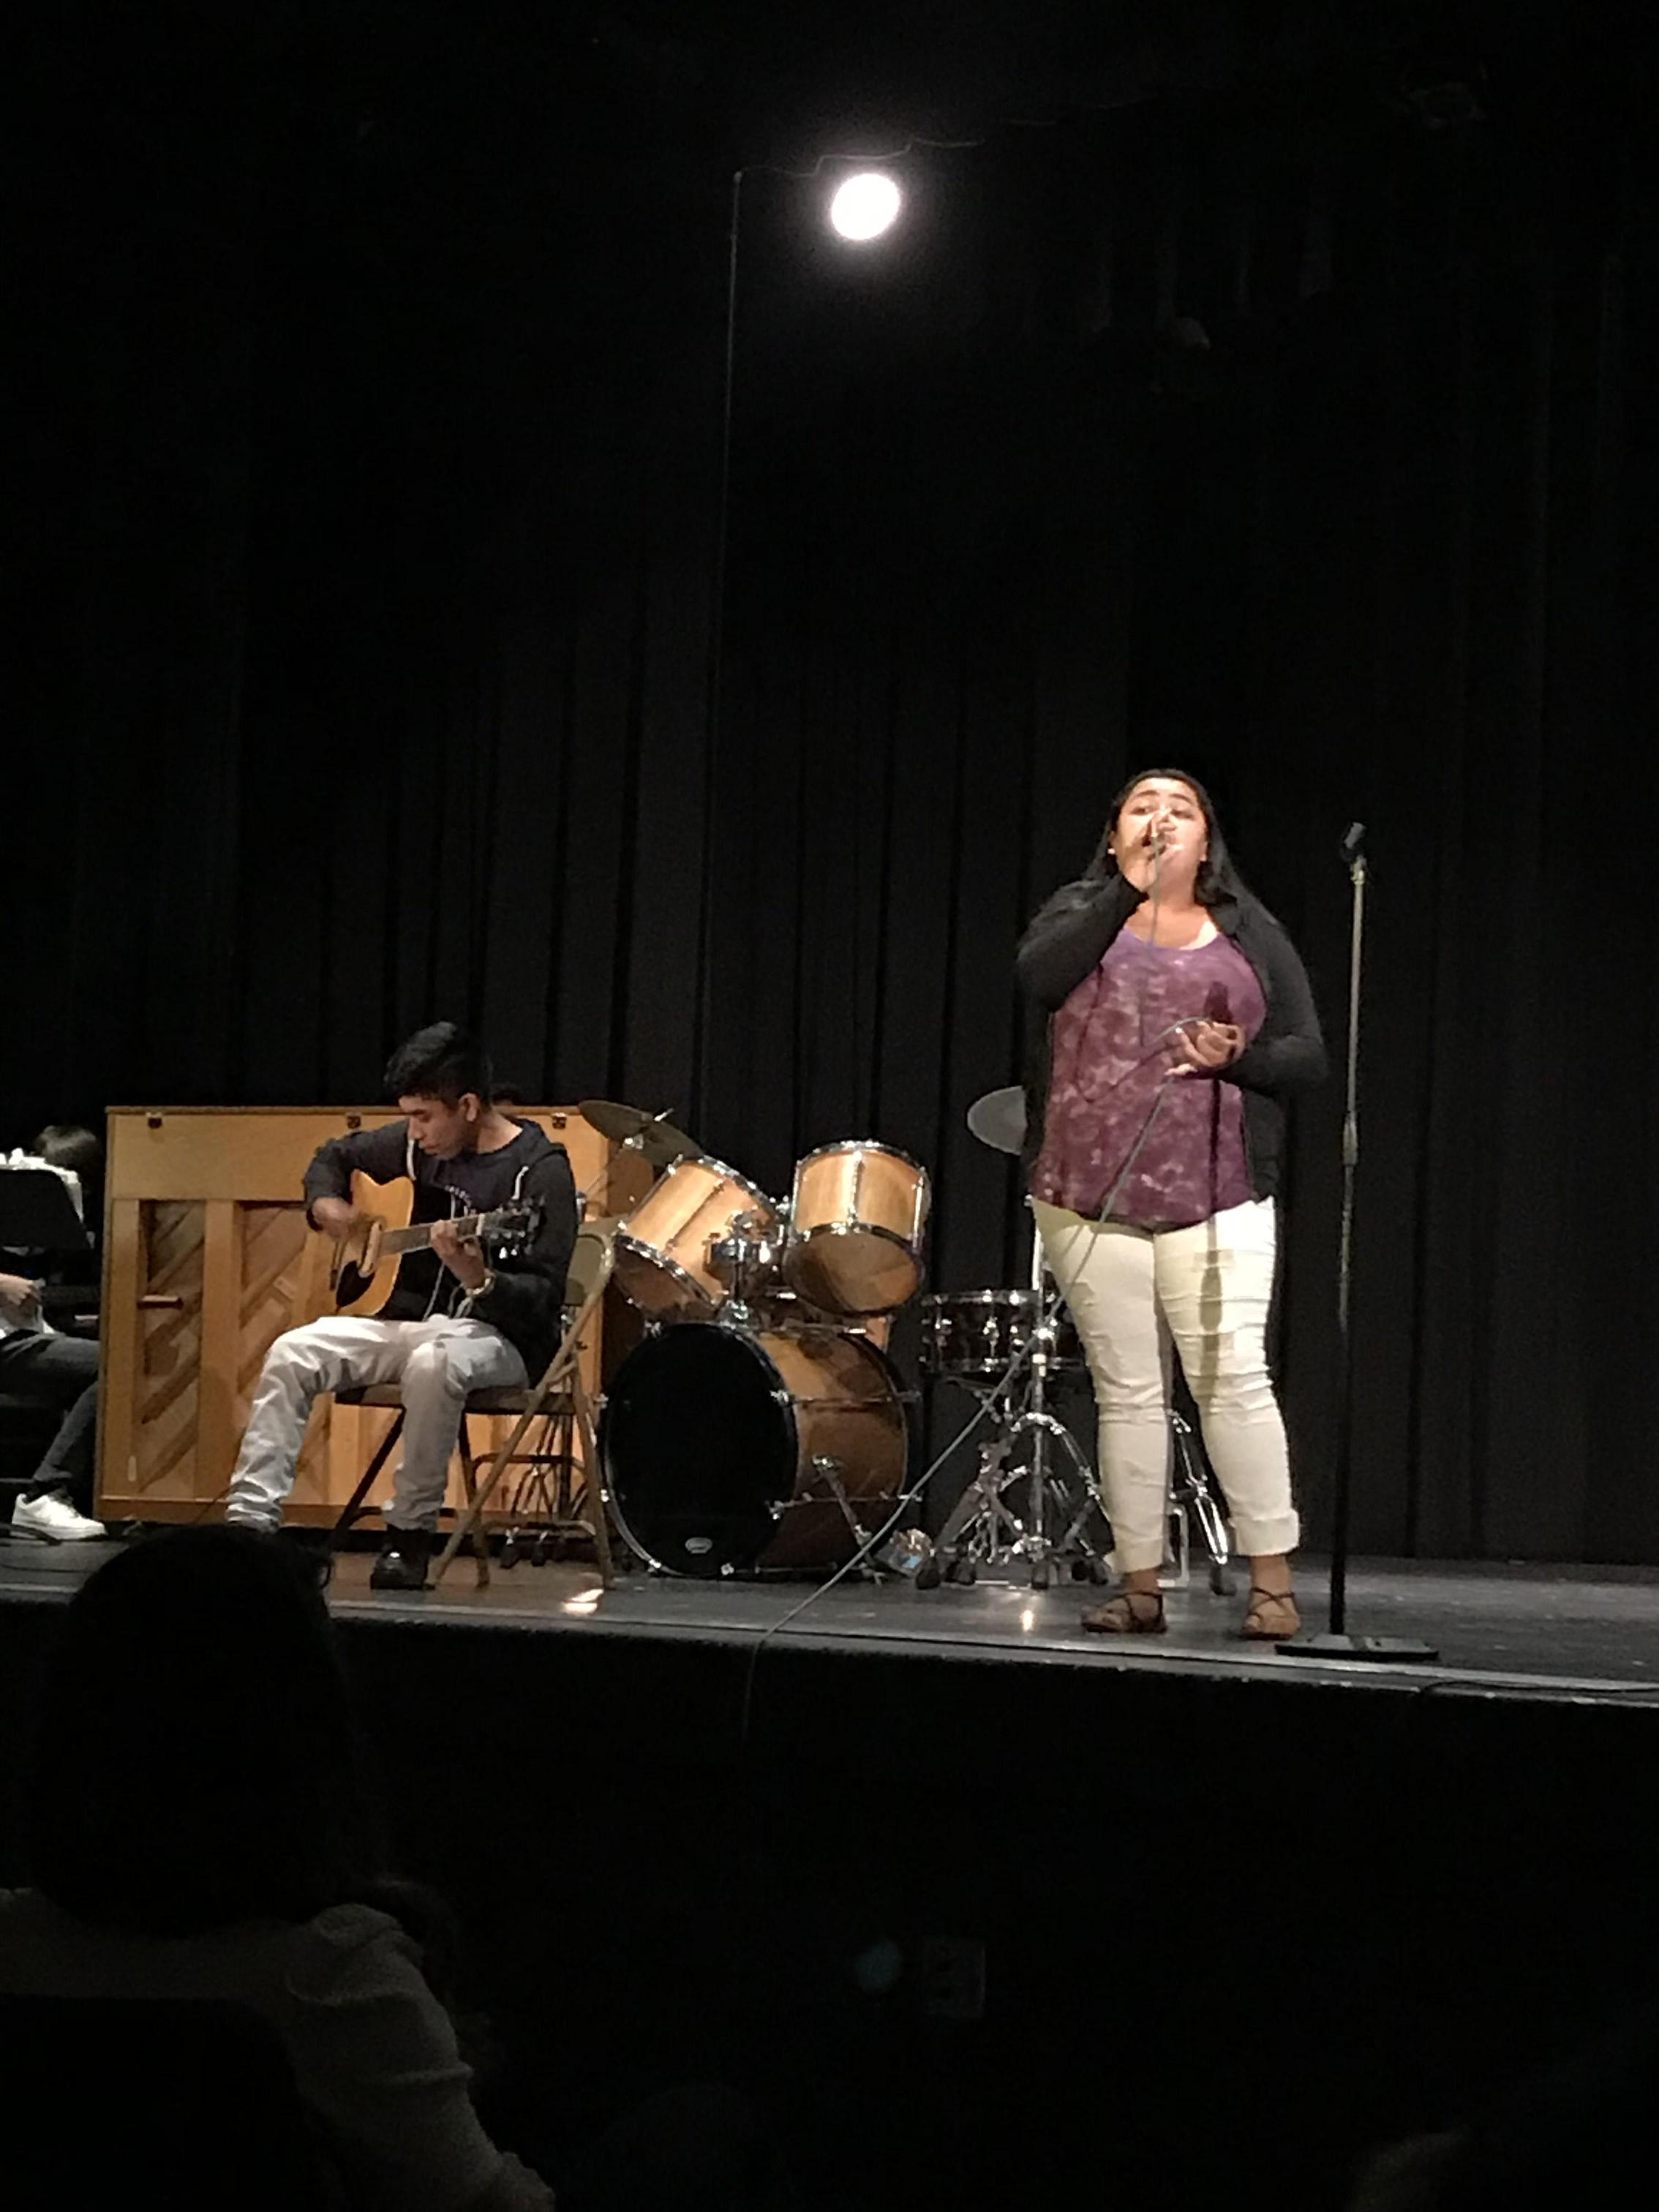 Student performance at Art Night